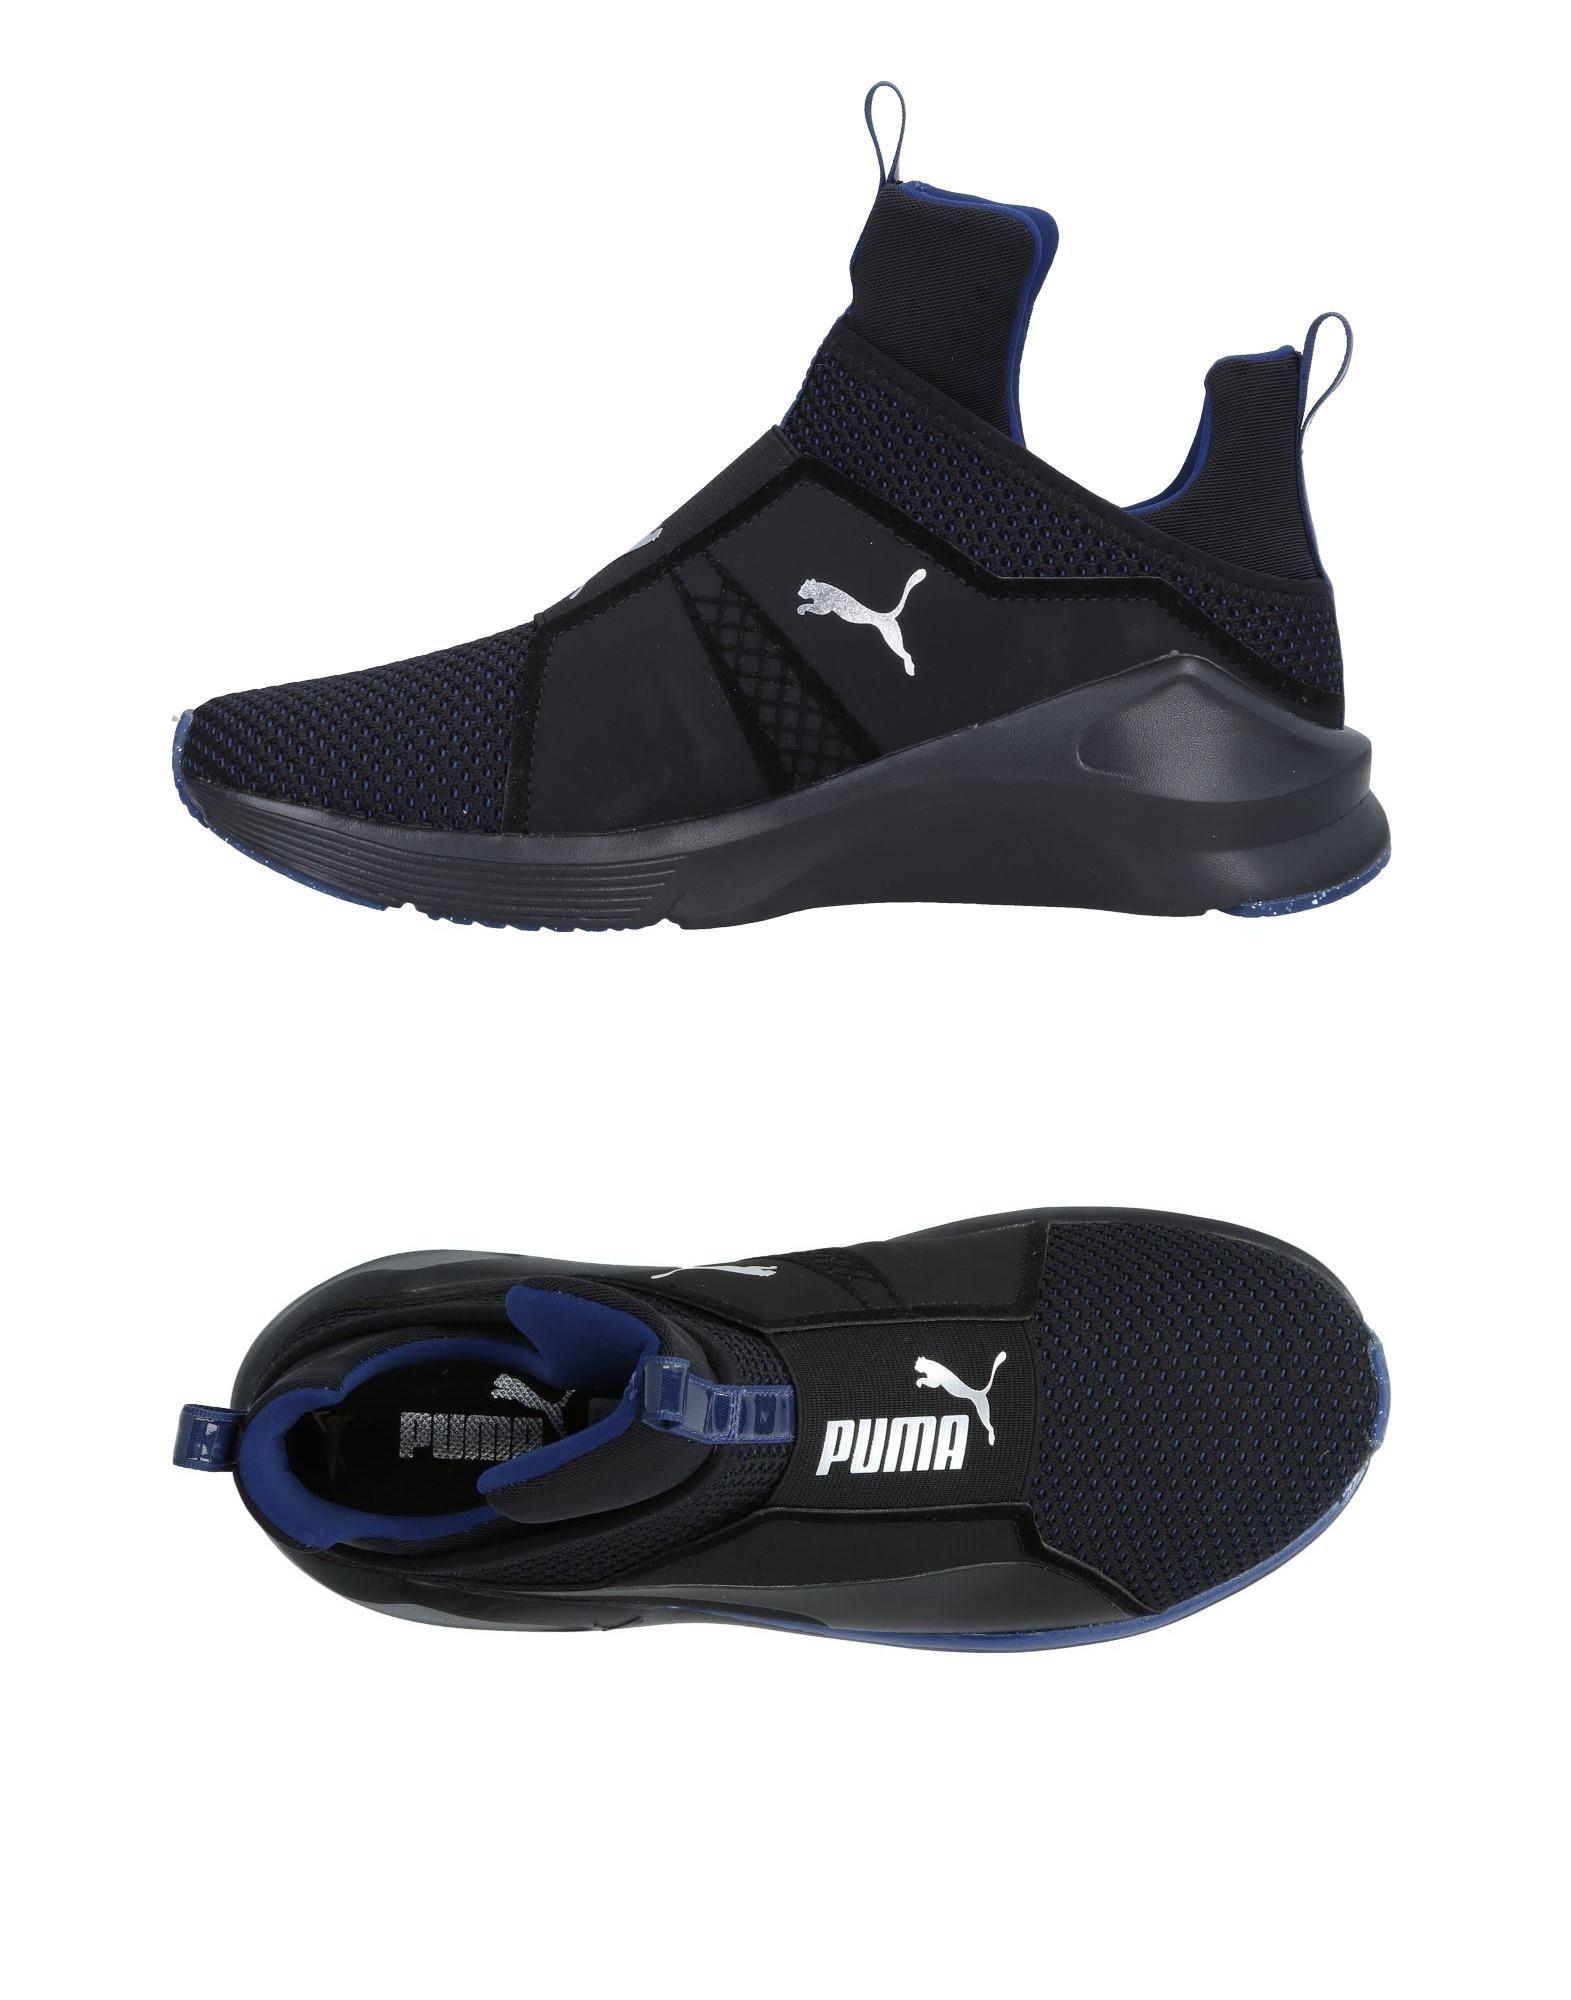 Puma Sneakers Gute Damen  11495769SL Gute Sneakers Qualität beliebte Schuhe 47110c